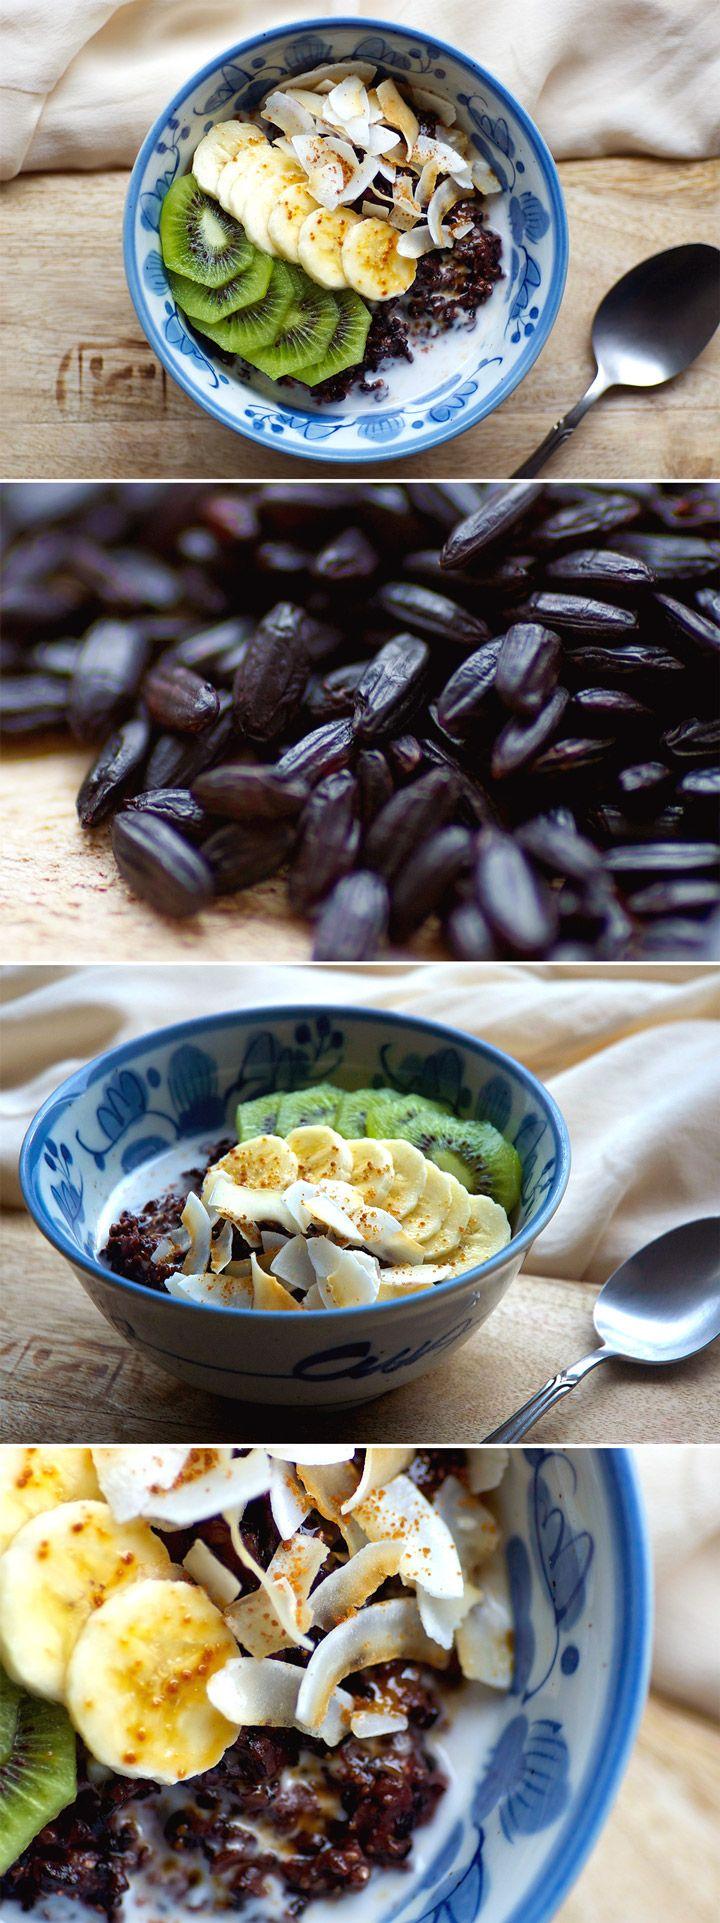 Black Rice and Chia Pudding | Food recipes, Food, Whole ...